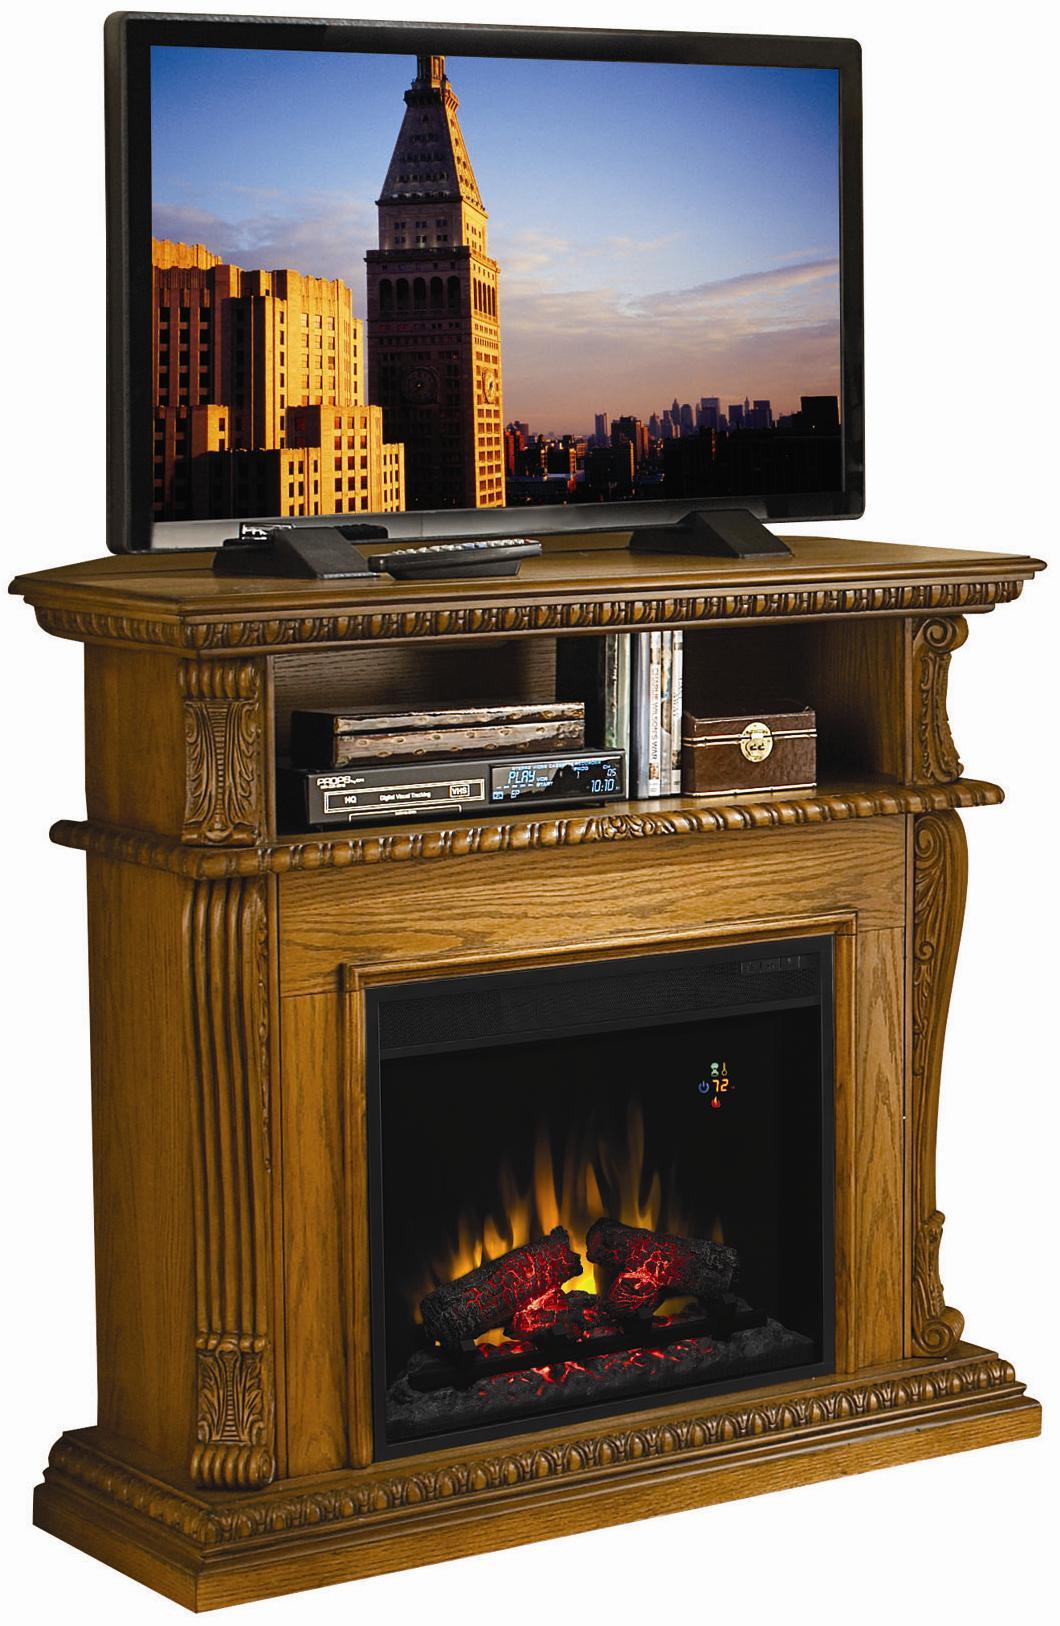 ClassicFlame Corinth  Corinth Electric Fireplace - Item Number: 23DE1447-O107